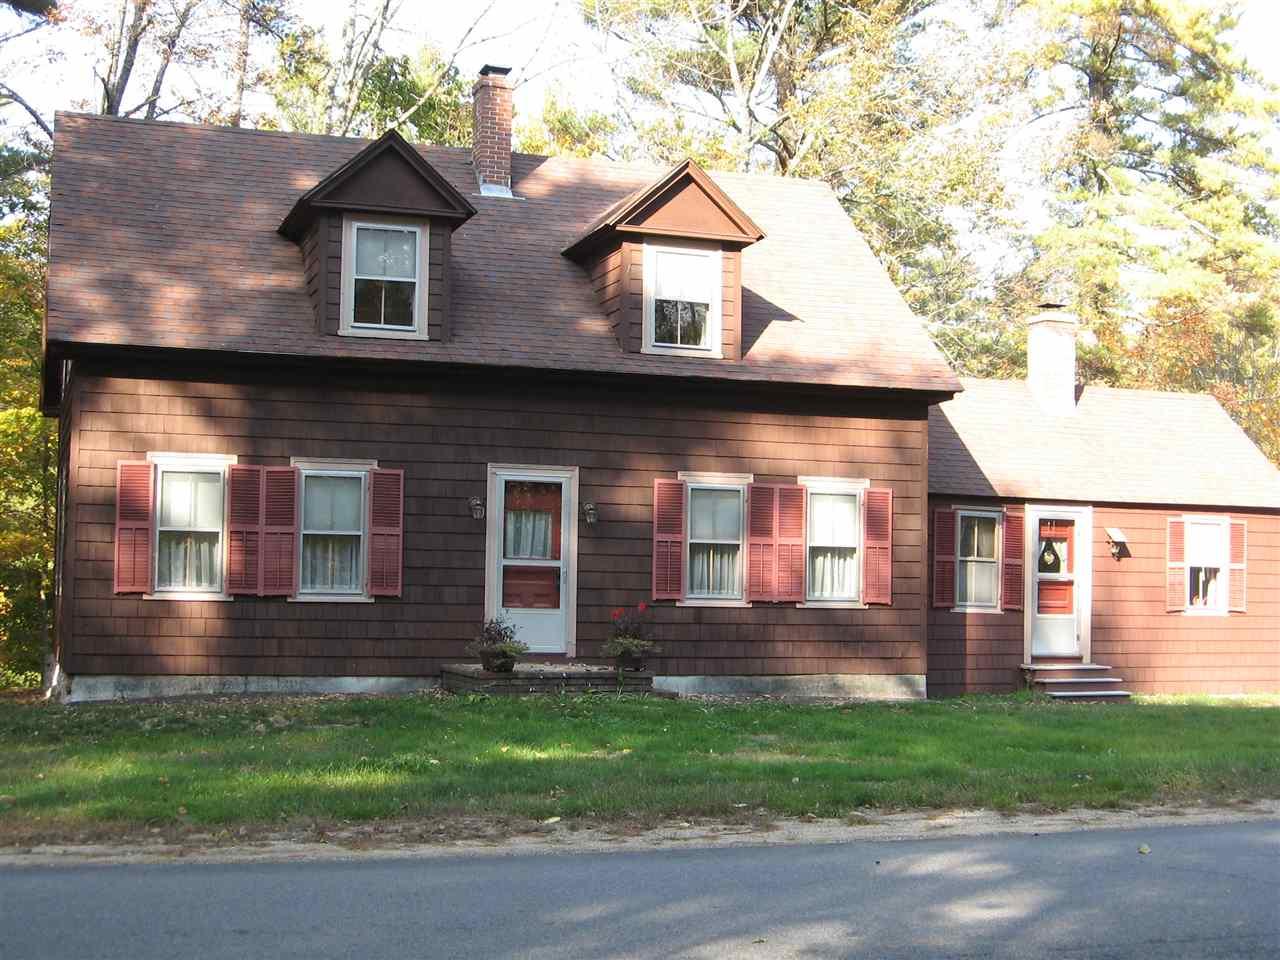 313 Whittier Road Tamworth 03886 Pinkham Real Estate